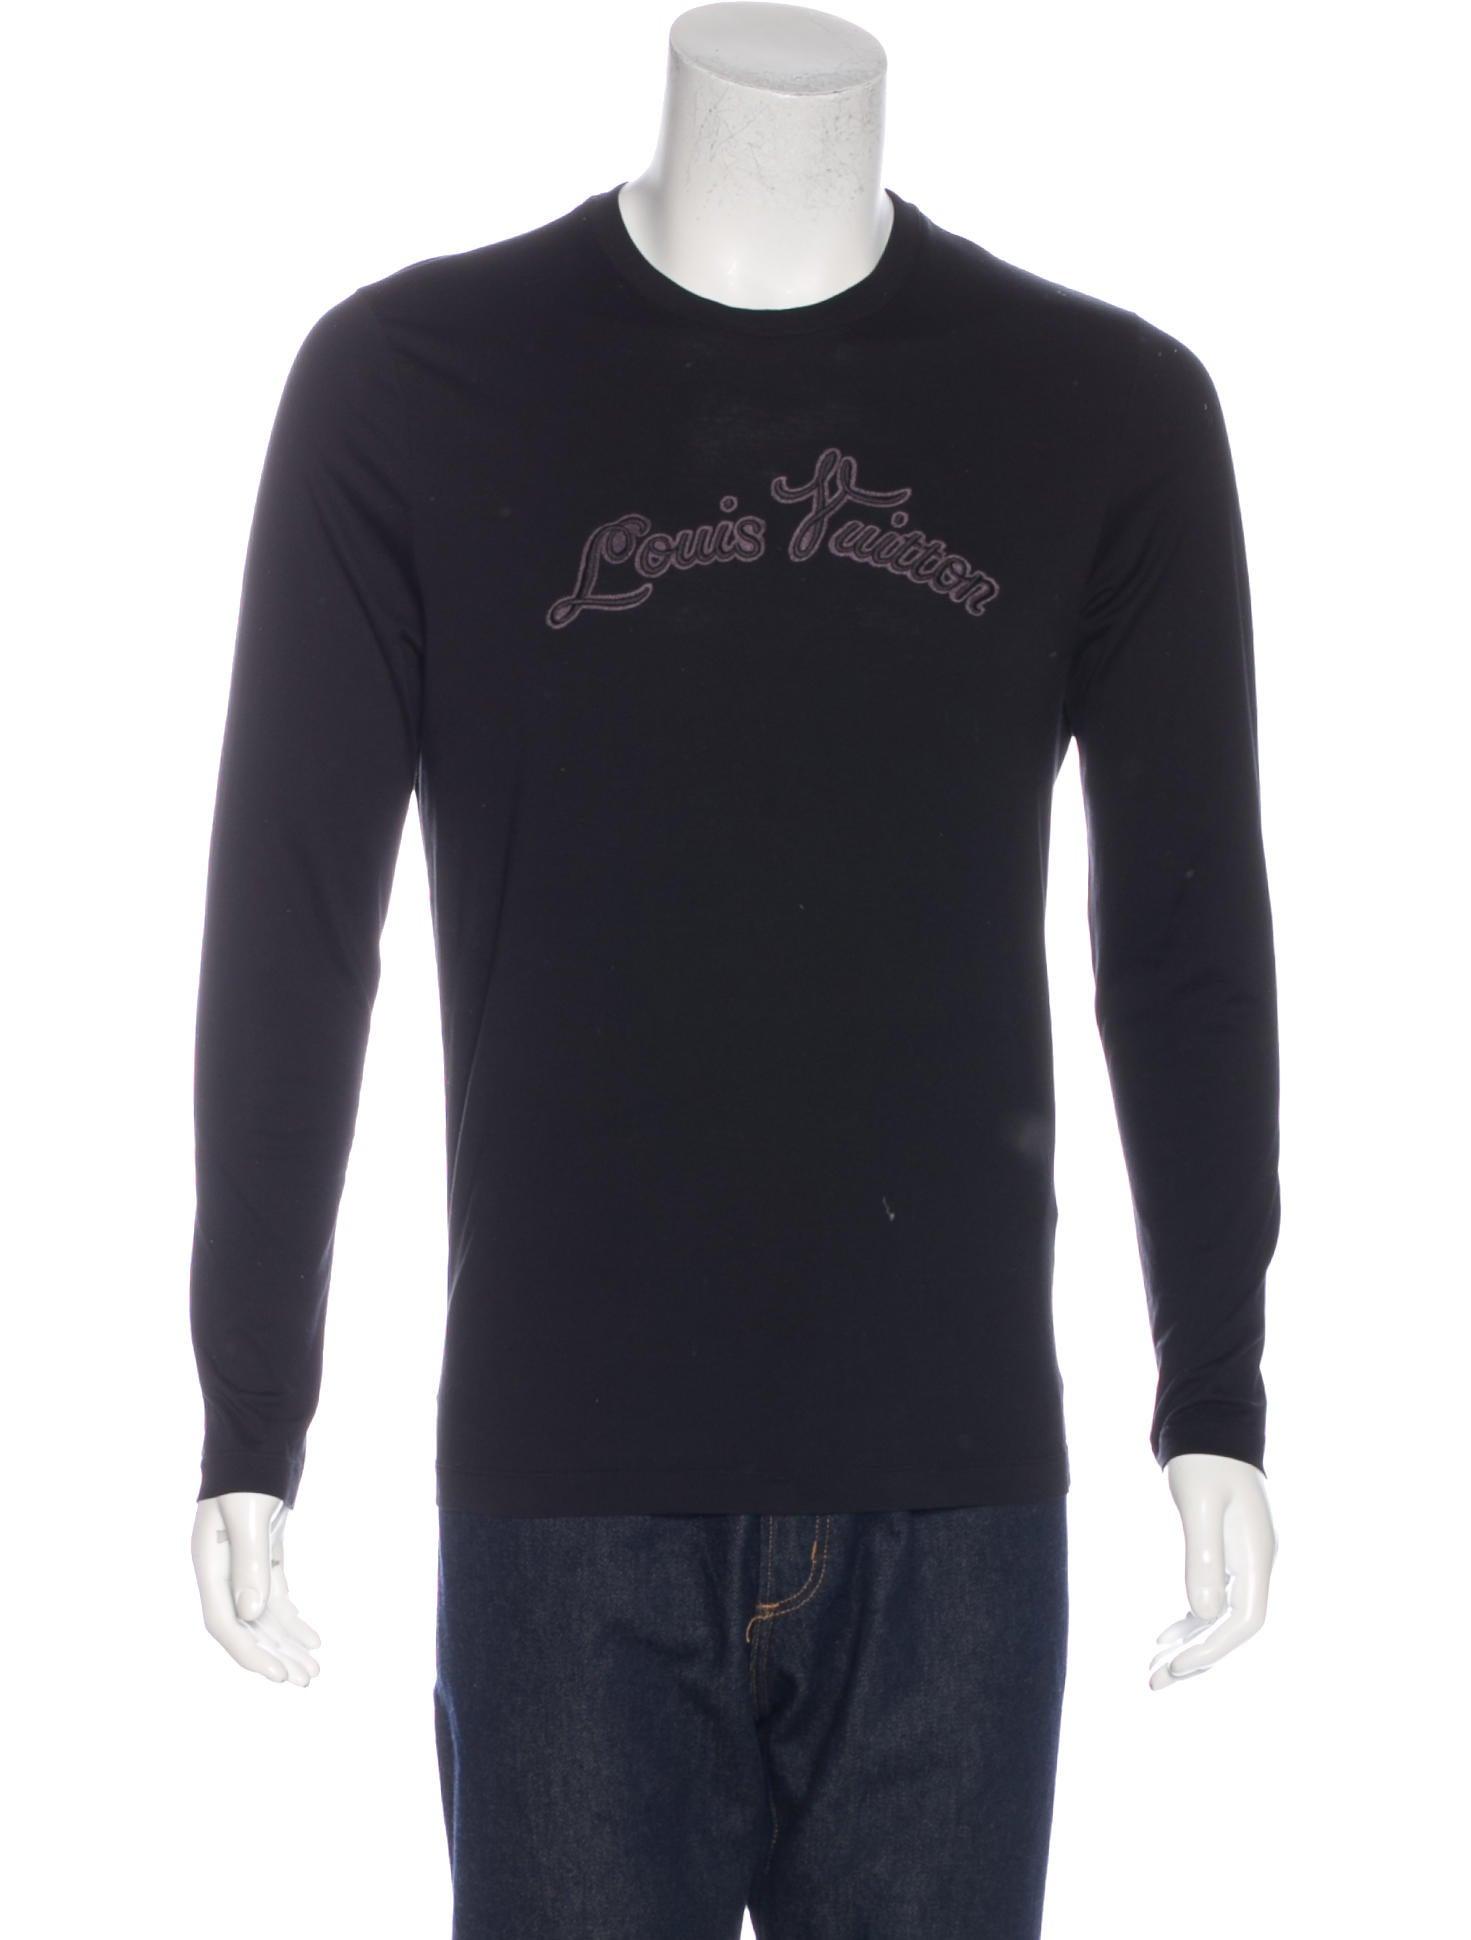 Louis vuitton logo embroidered t shirt clothing for Shirt with logo embroidered